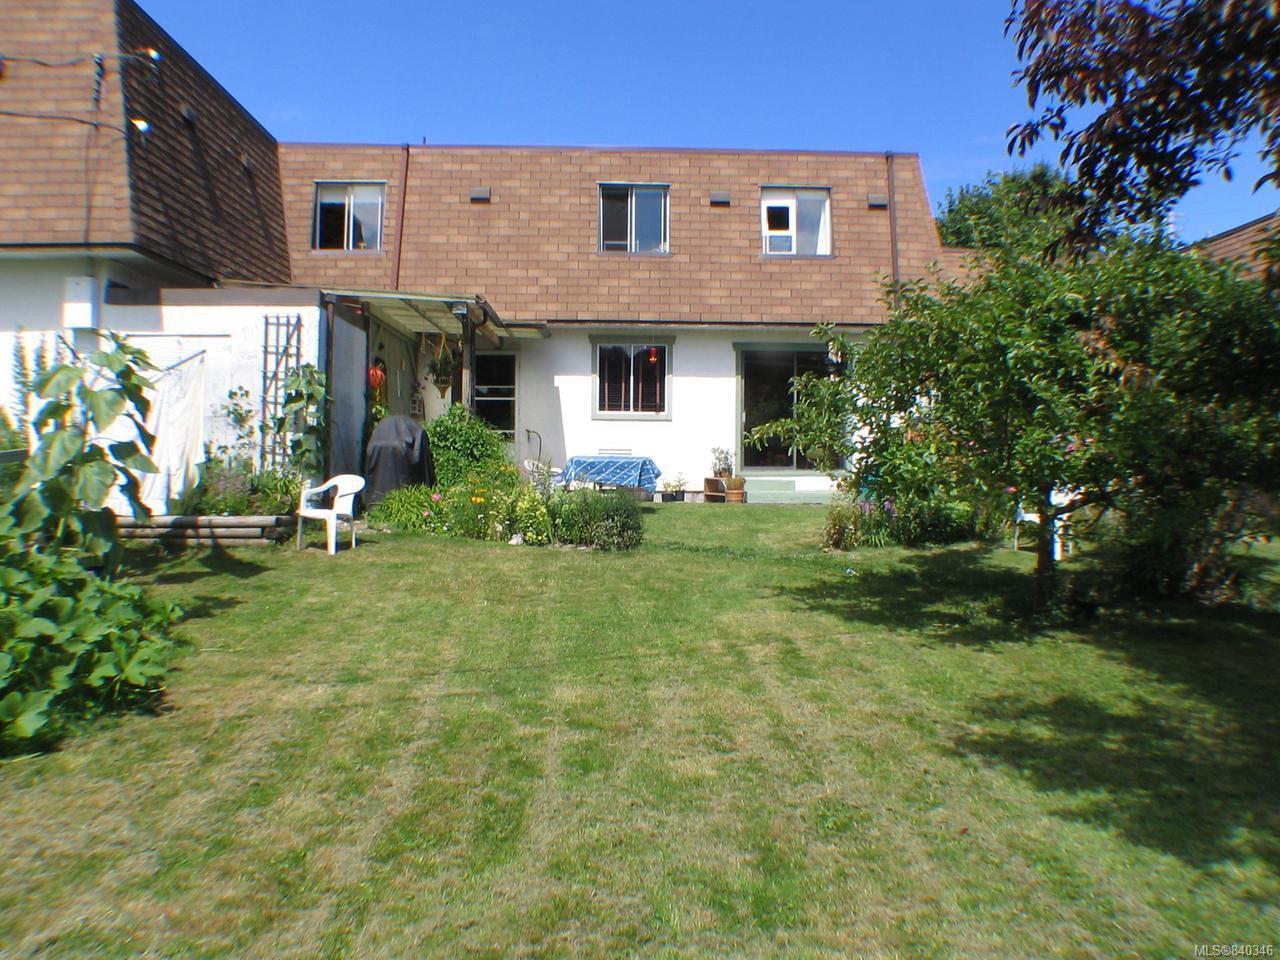 Main Photo: 6 3208 Gibbins Rd in DUNCAN: Du West Duncan Row/Townhouse for sale (Duncan)  : MLS®# 840346